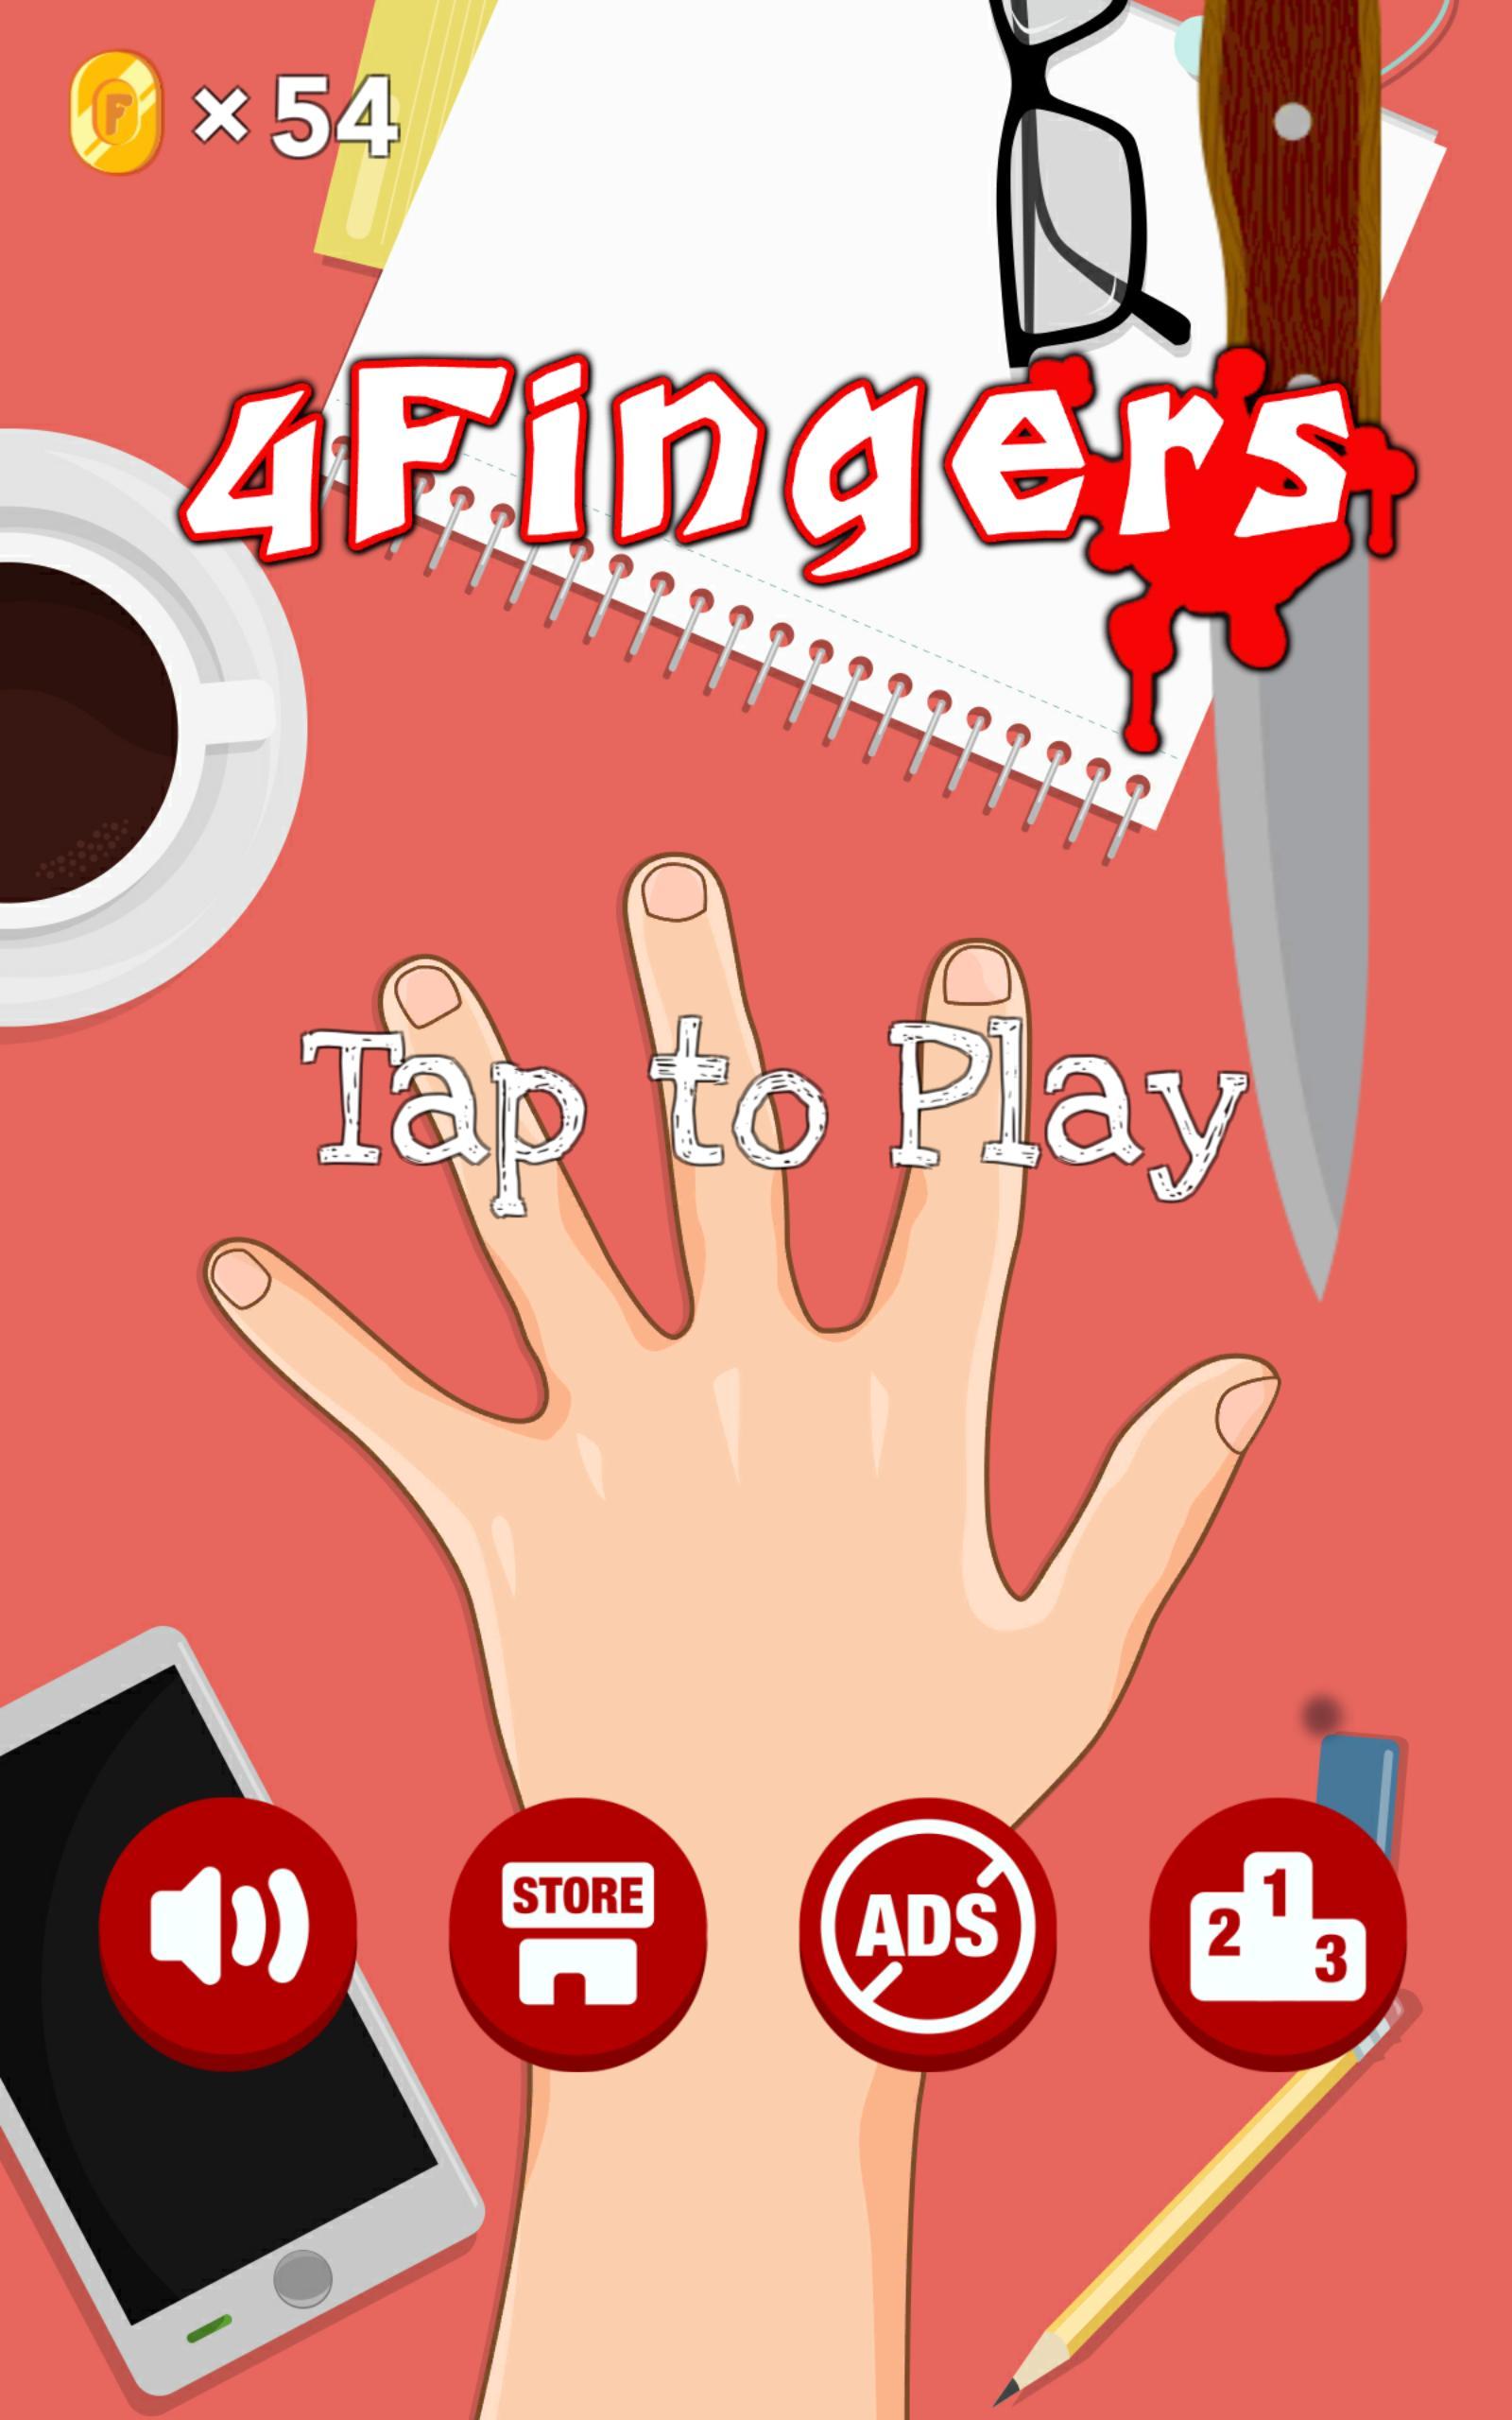 4 Fingers - free knife games 3.4 Screenshot 11